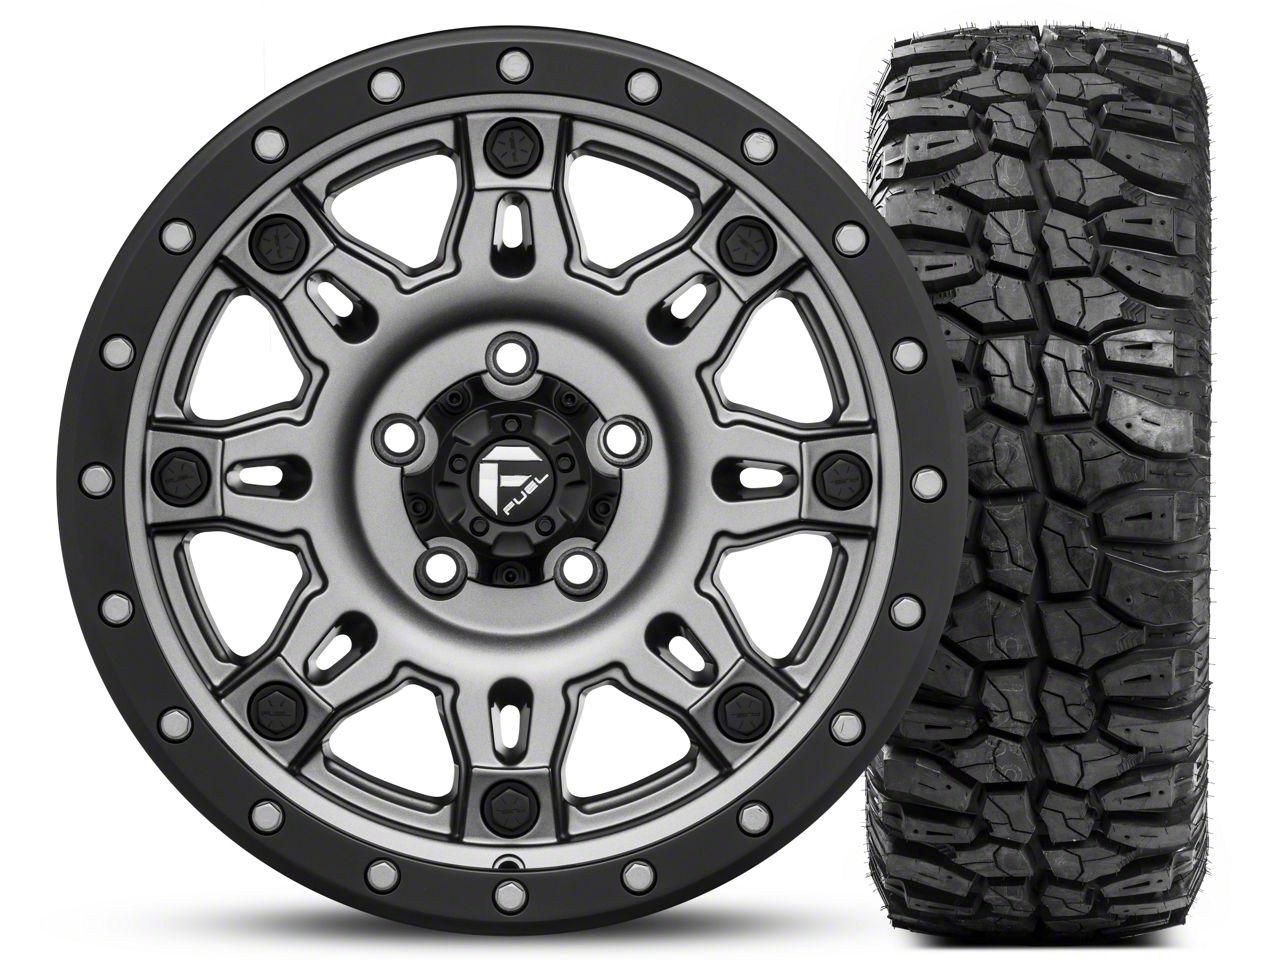 Fuel Wheels Hostage III Gunmetal and Black Wheel 17x9 and Mudclaw M/T LT265/70R17 Kit (07-18 Jeep Wrangler JK; 2018 Jeep Wrangler JL)